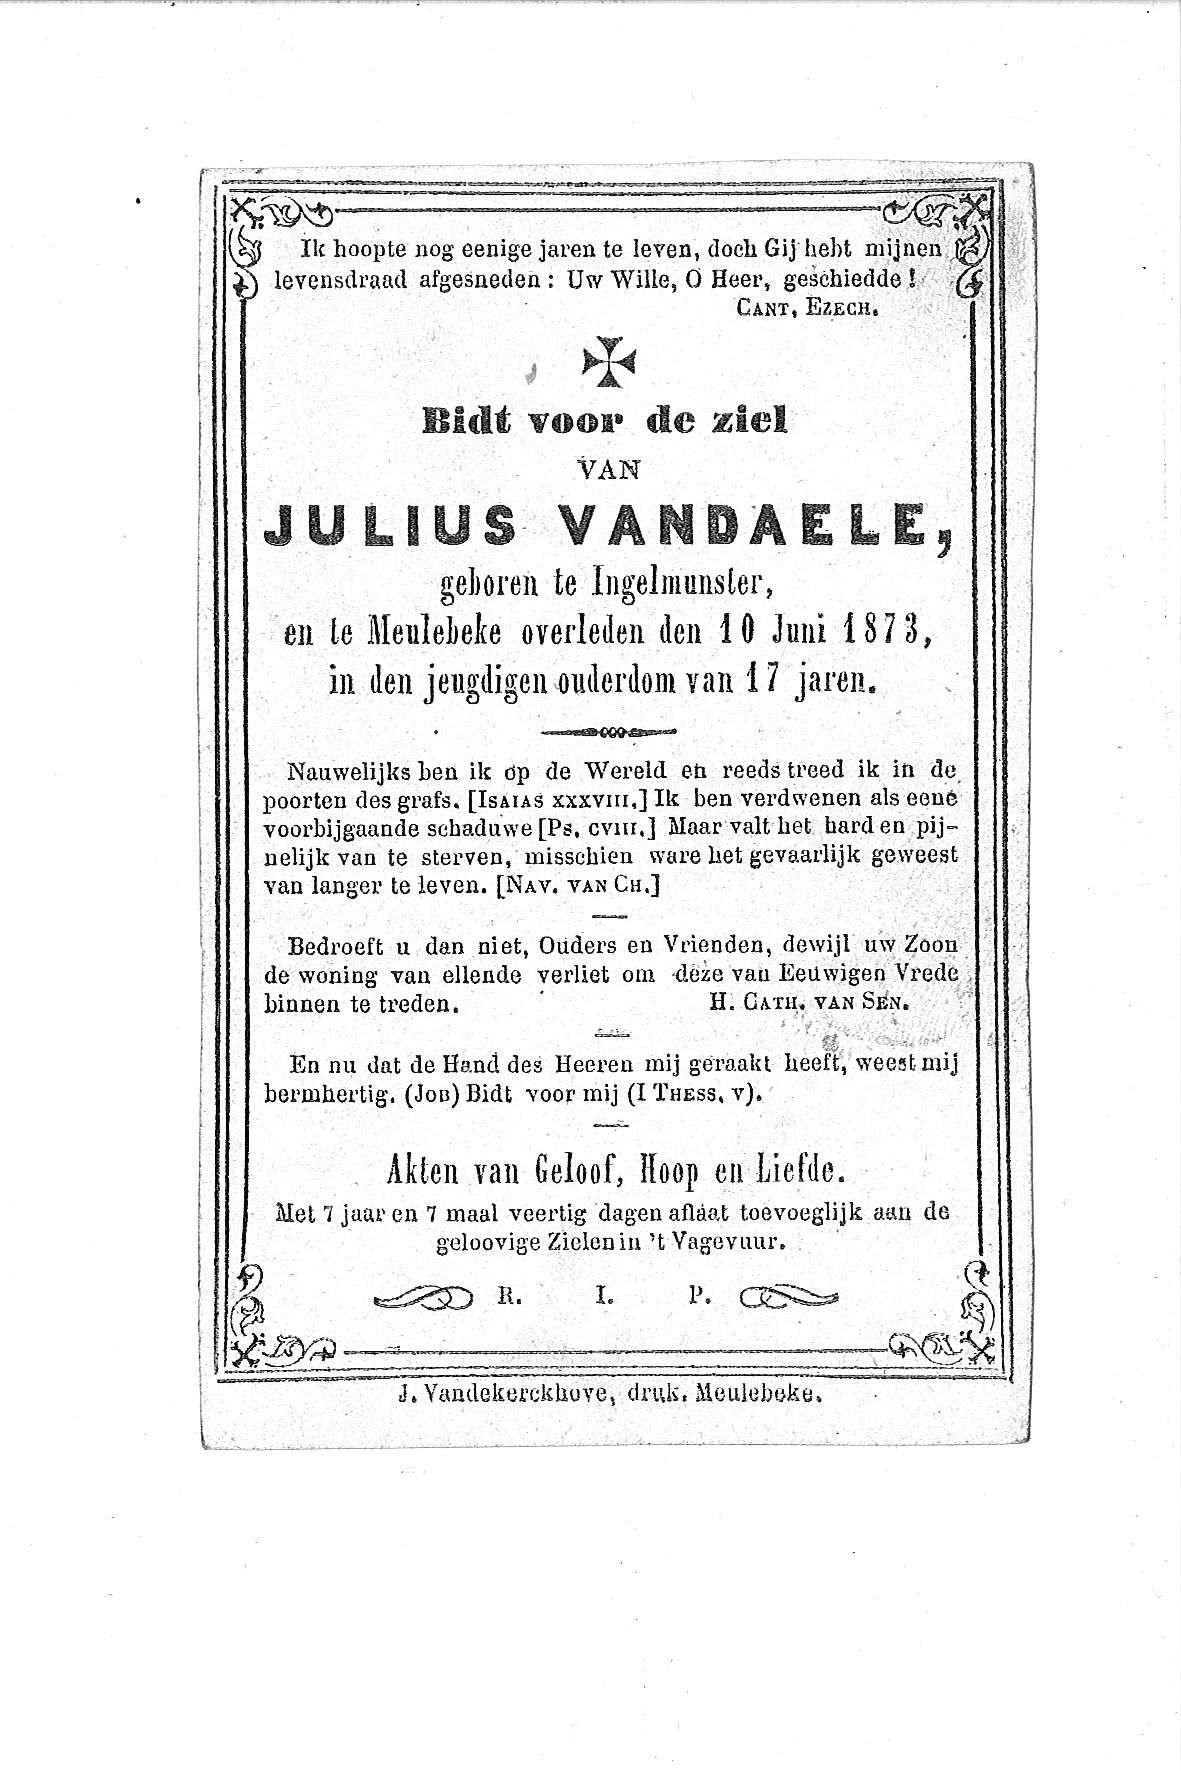 Julius(1873)20091211101053_00020.jpg